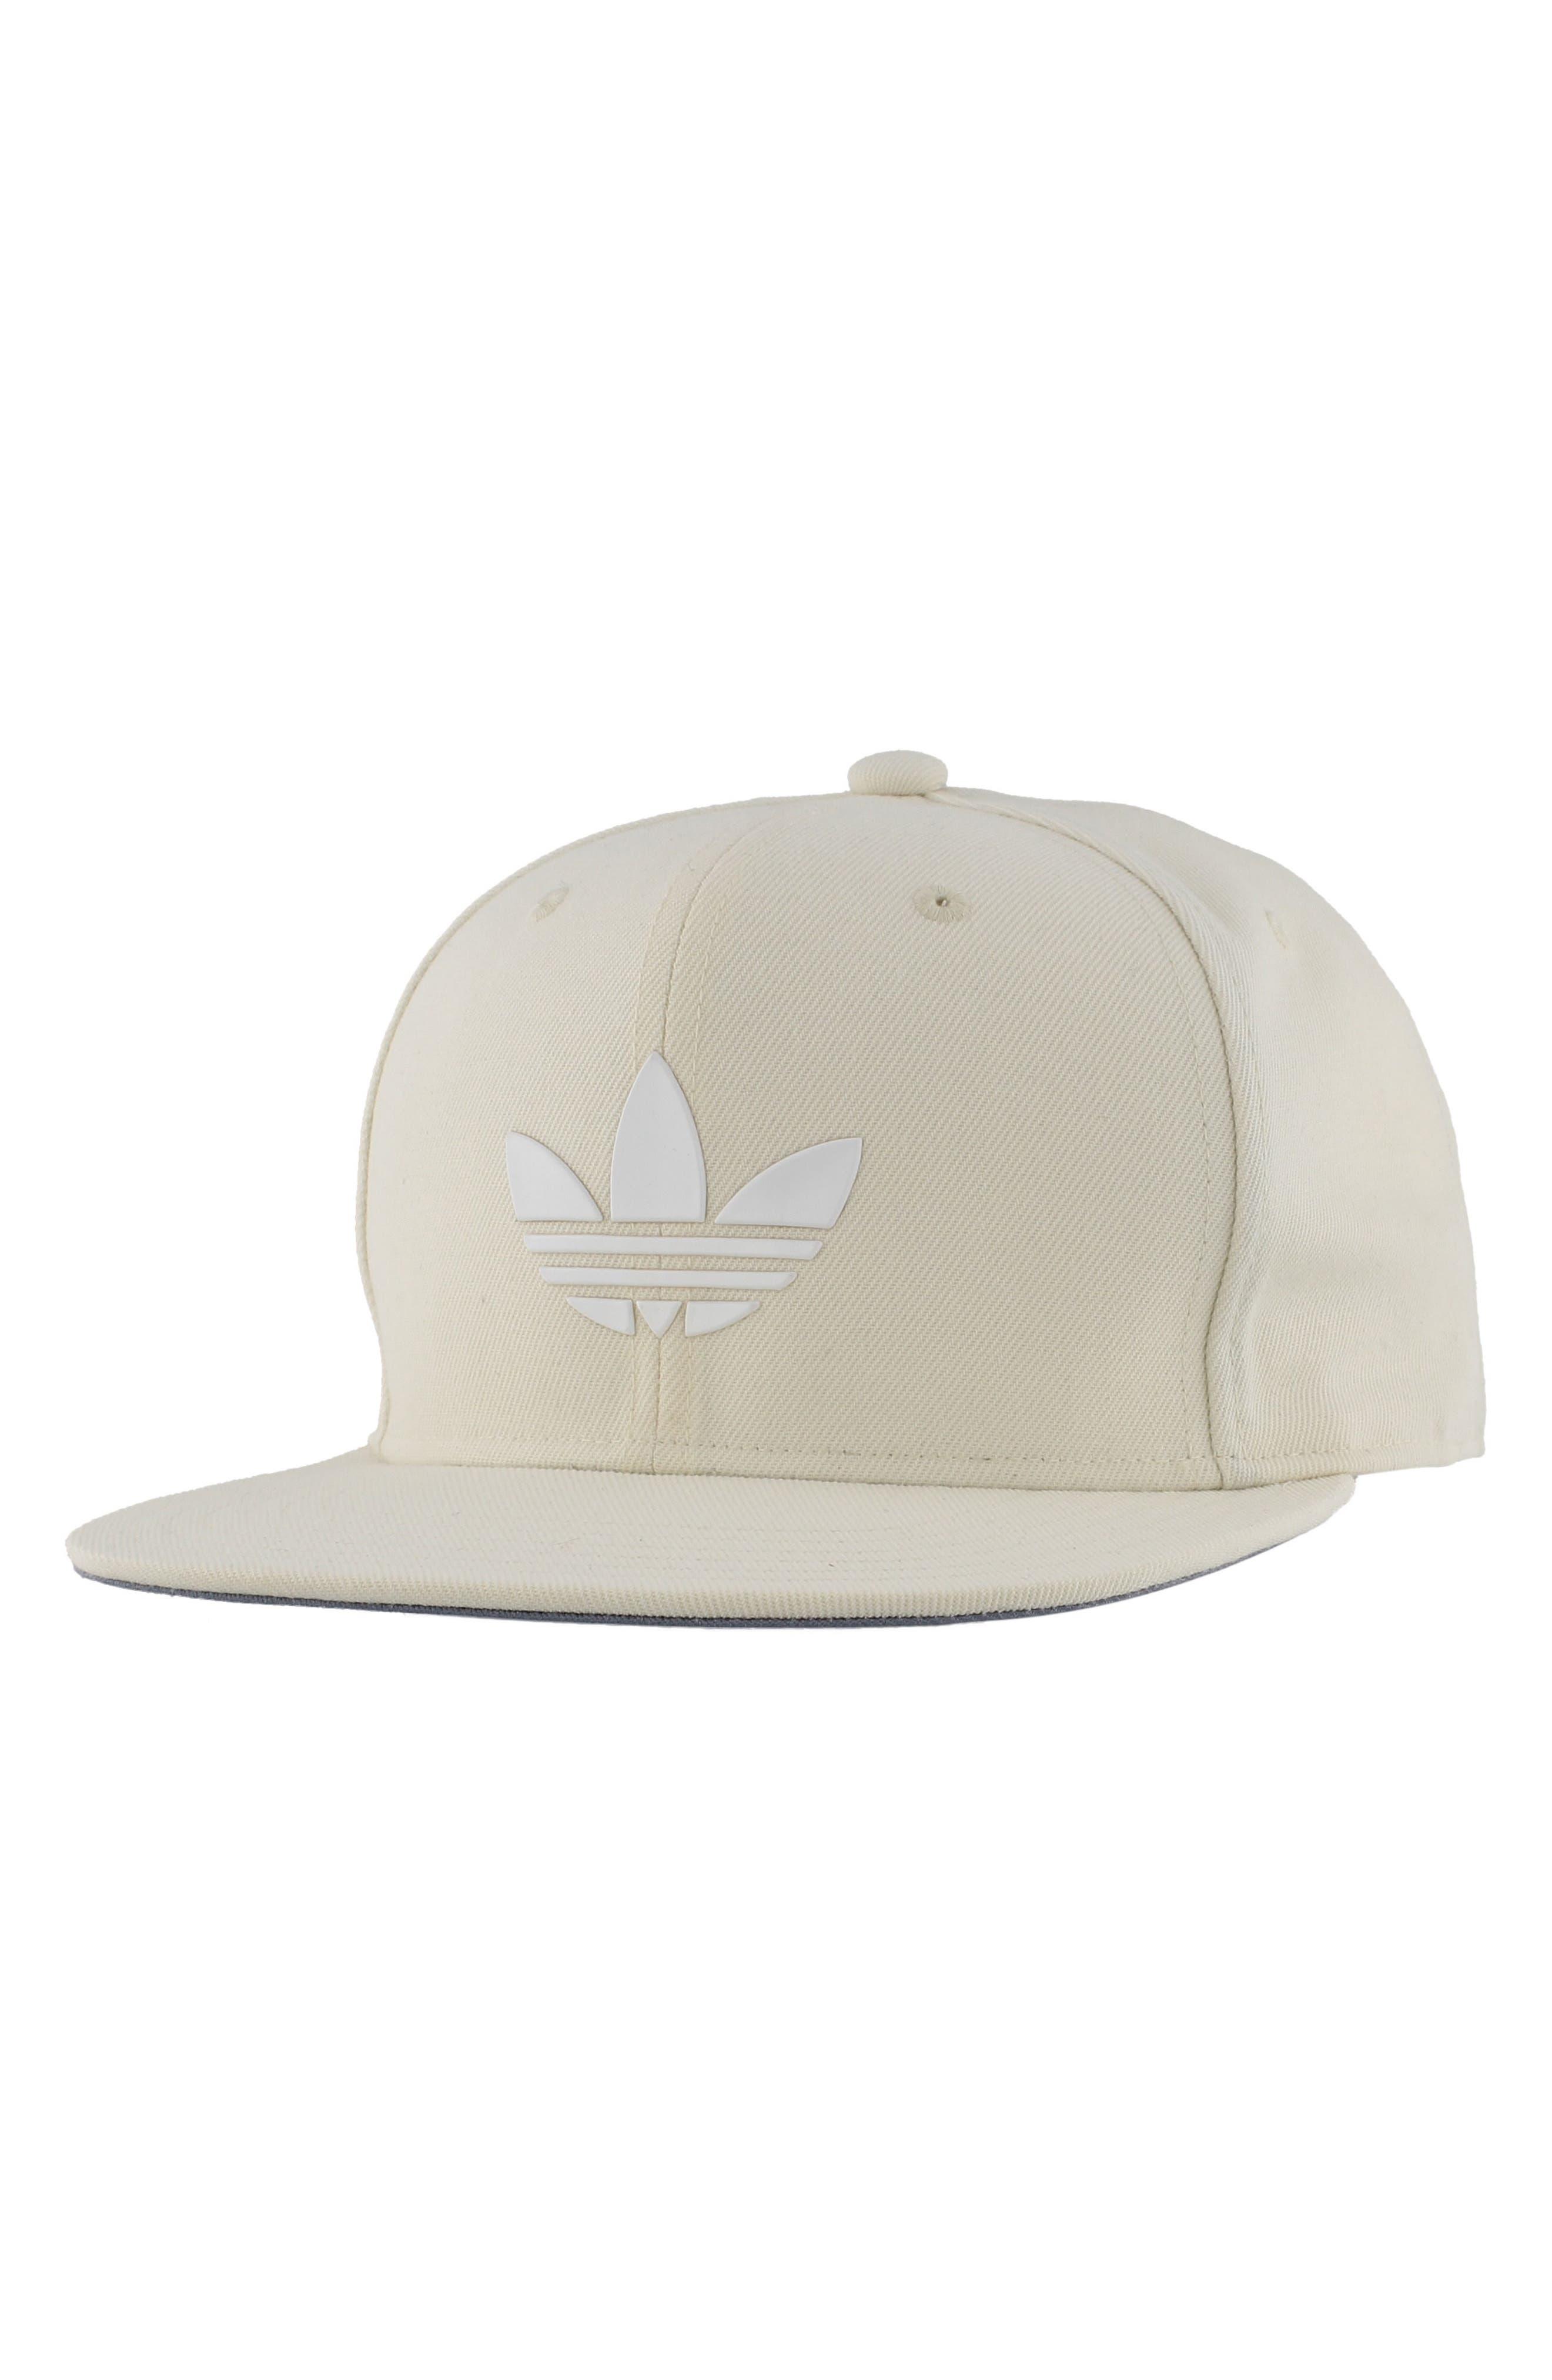 adidas Originals Ori Trefoil Plus Snapback Baseball Cap